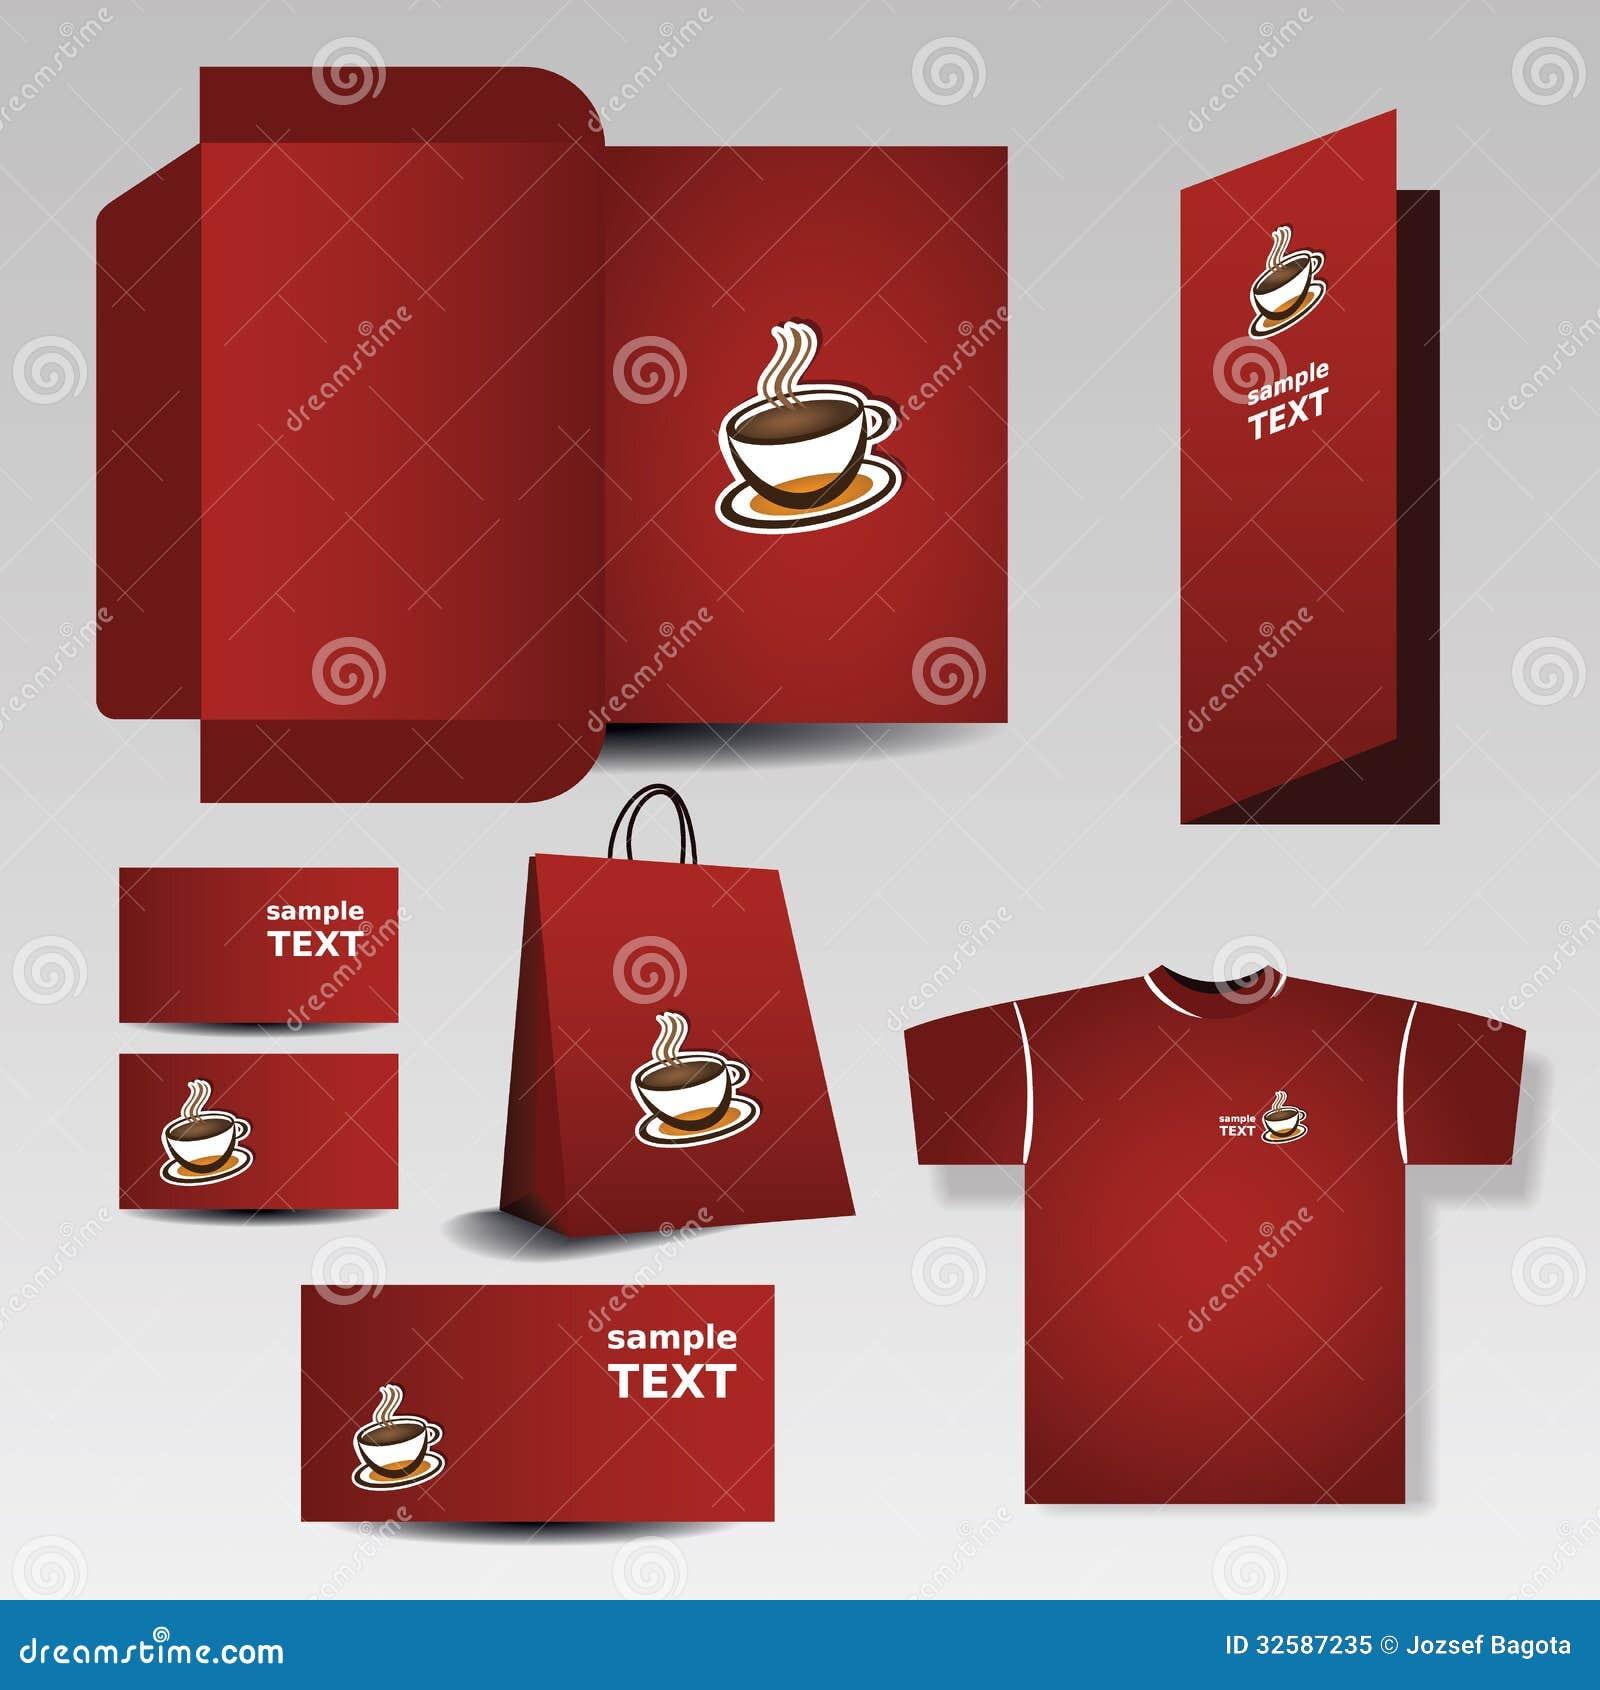 stationery template design business set royalty free stock photo image 32587235. Black Bedroom Furniture Sets. Home Design Ideas